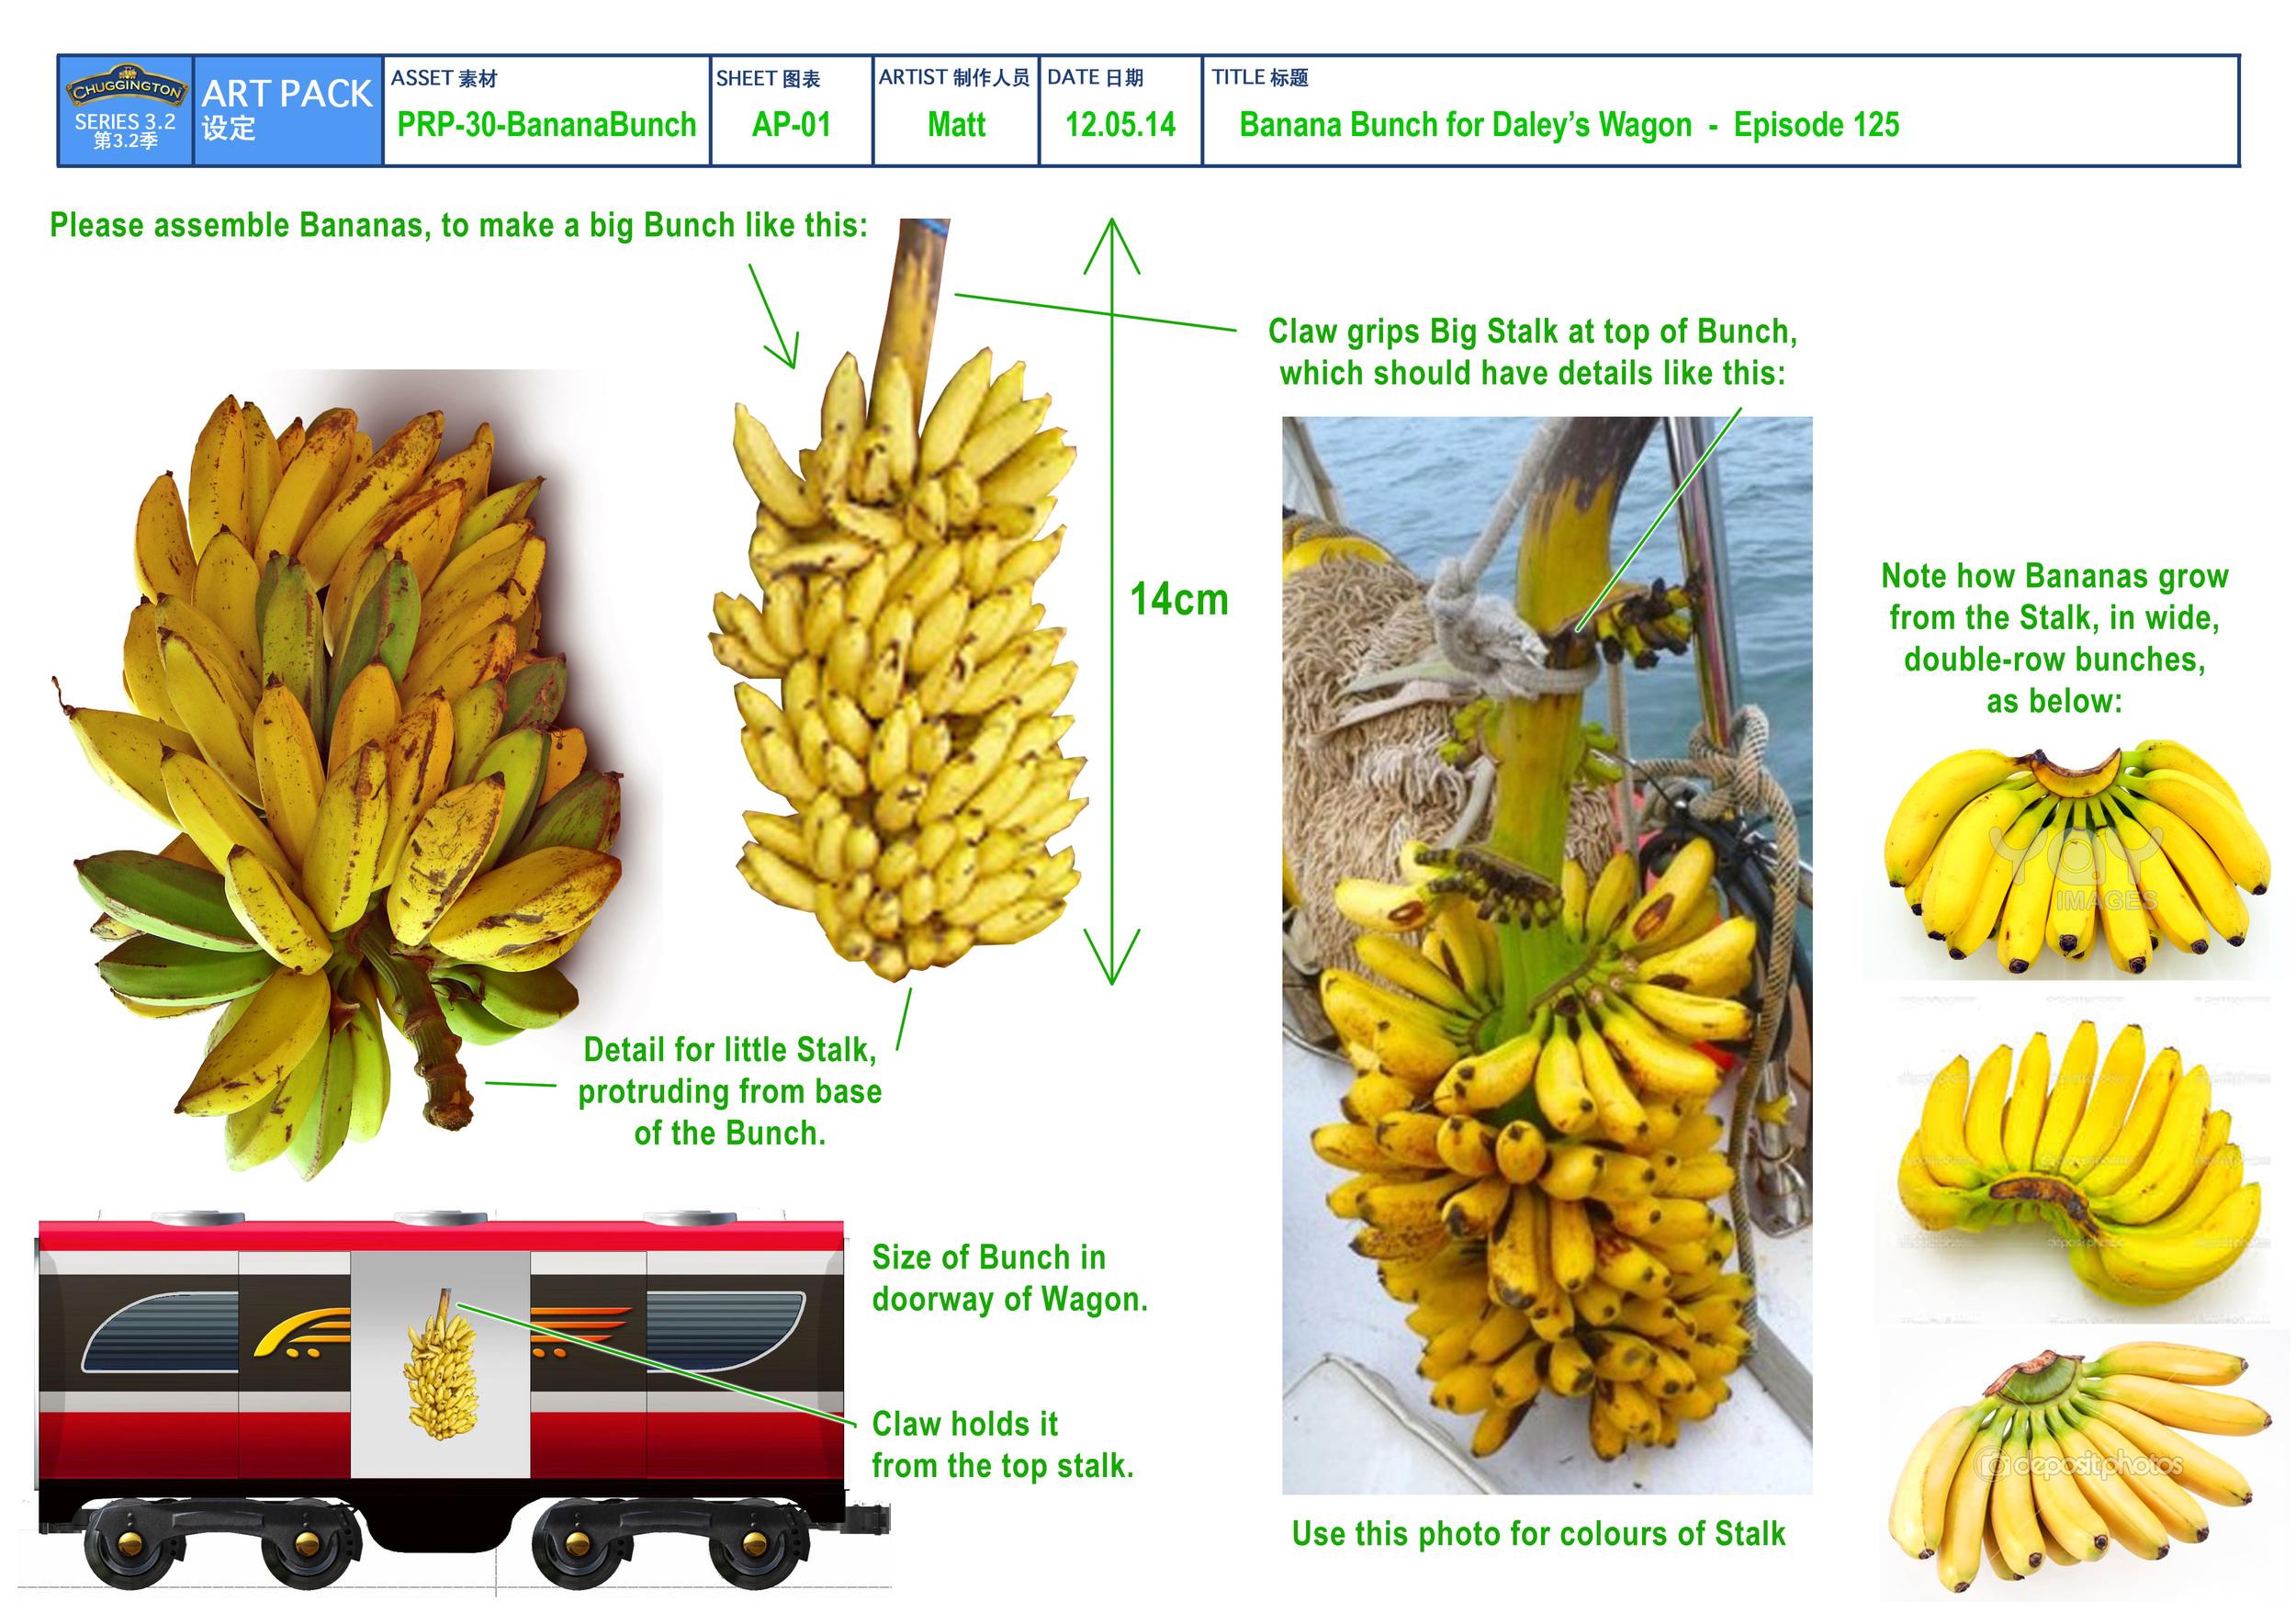 PRP-BananaBunch_AP-01_2014.05.12.jpg